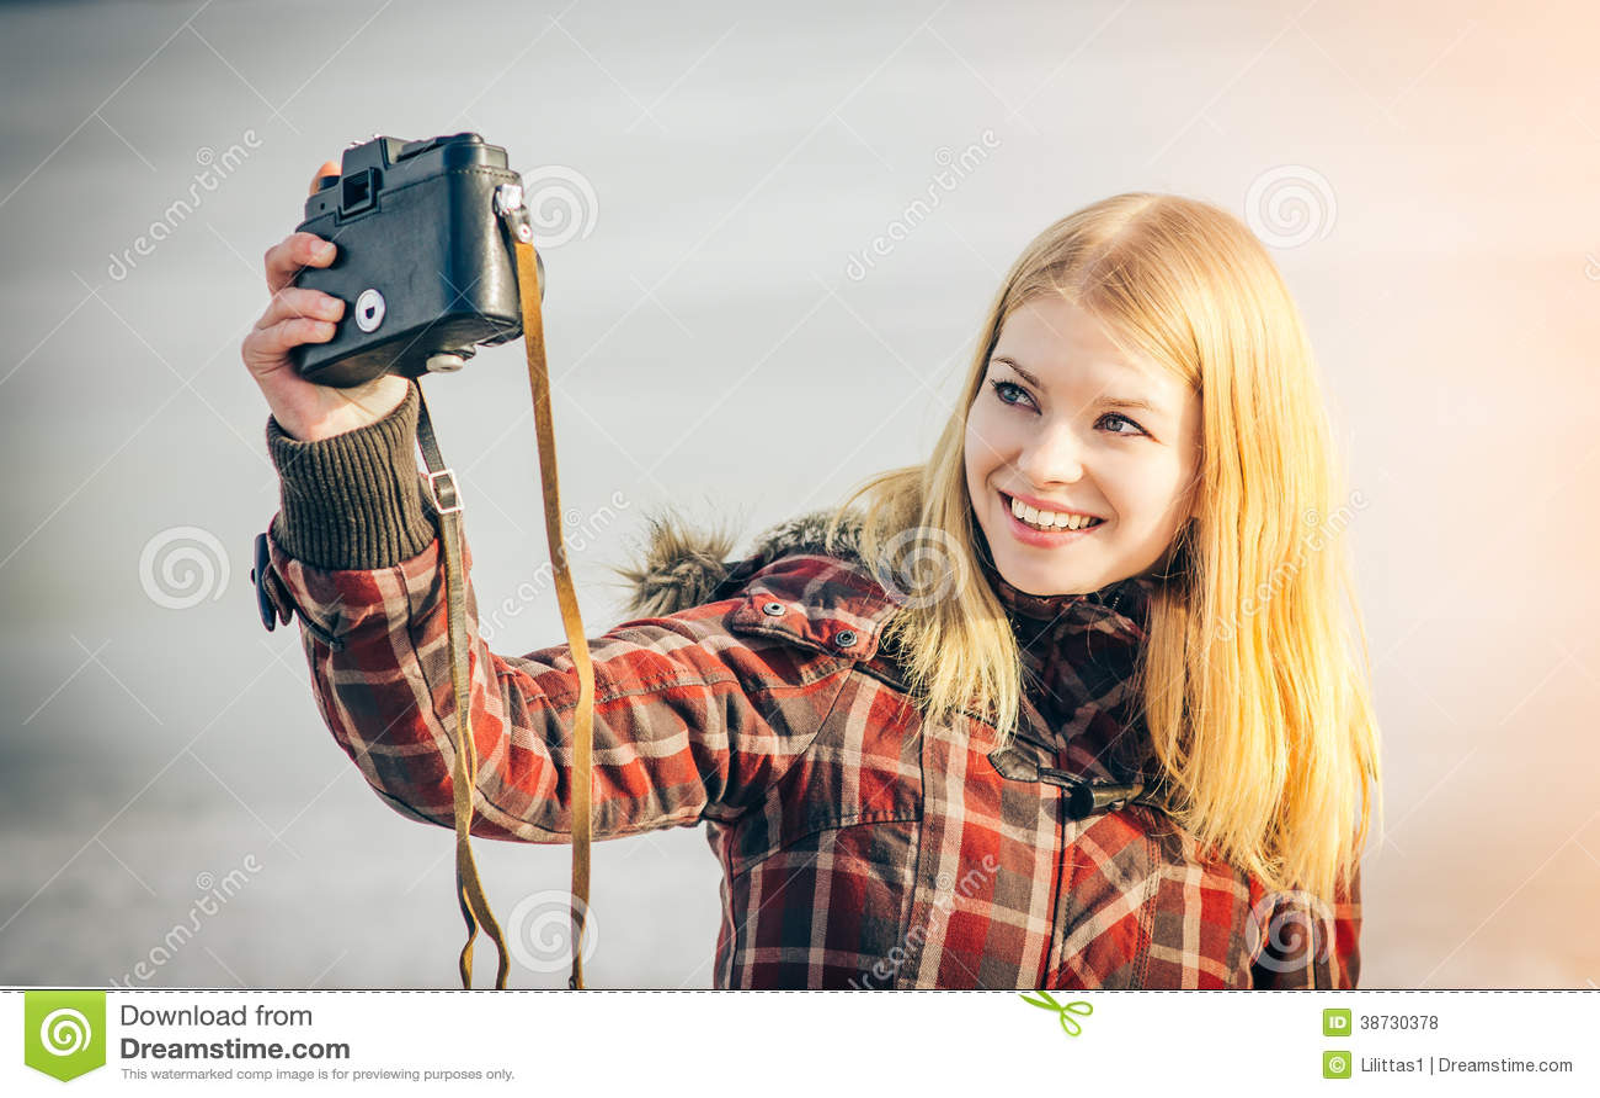 shot self Blonde girl